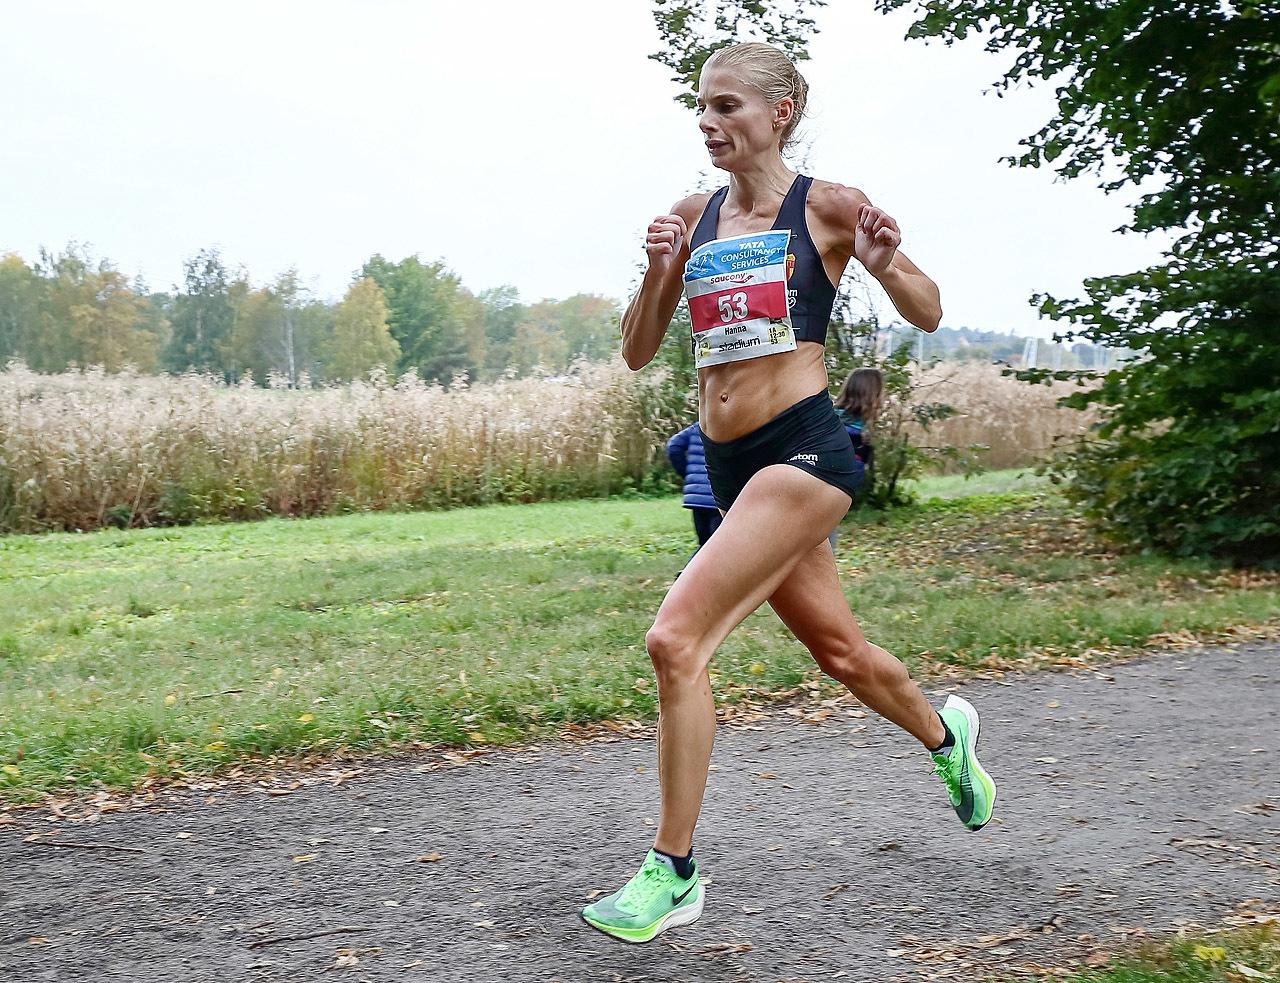 30km_Hanna_Lindholm_1280_190928_lidingoloppet_PRESS_009.jpg